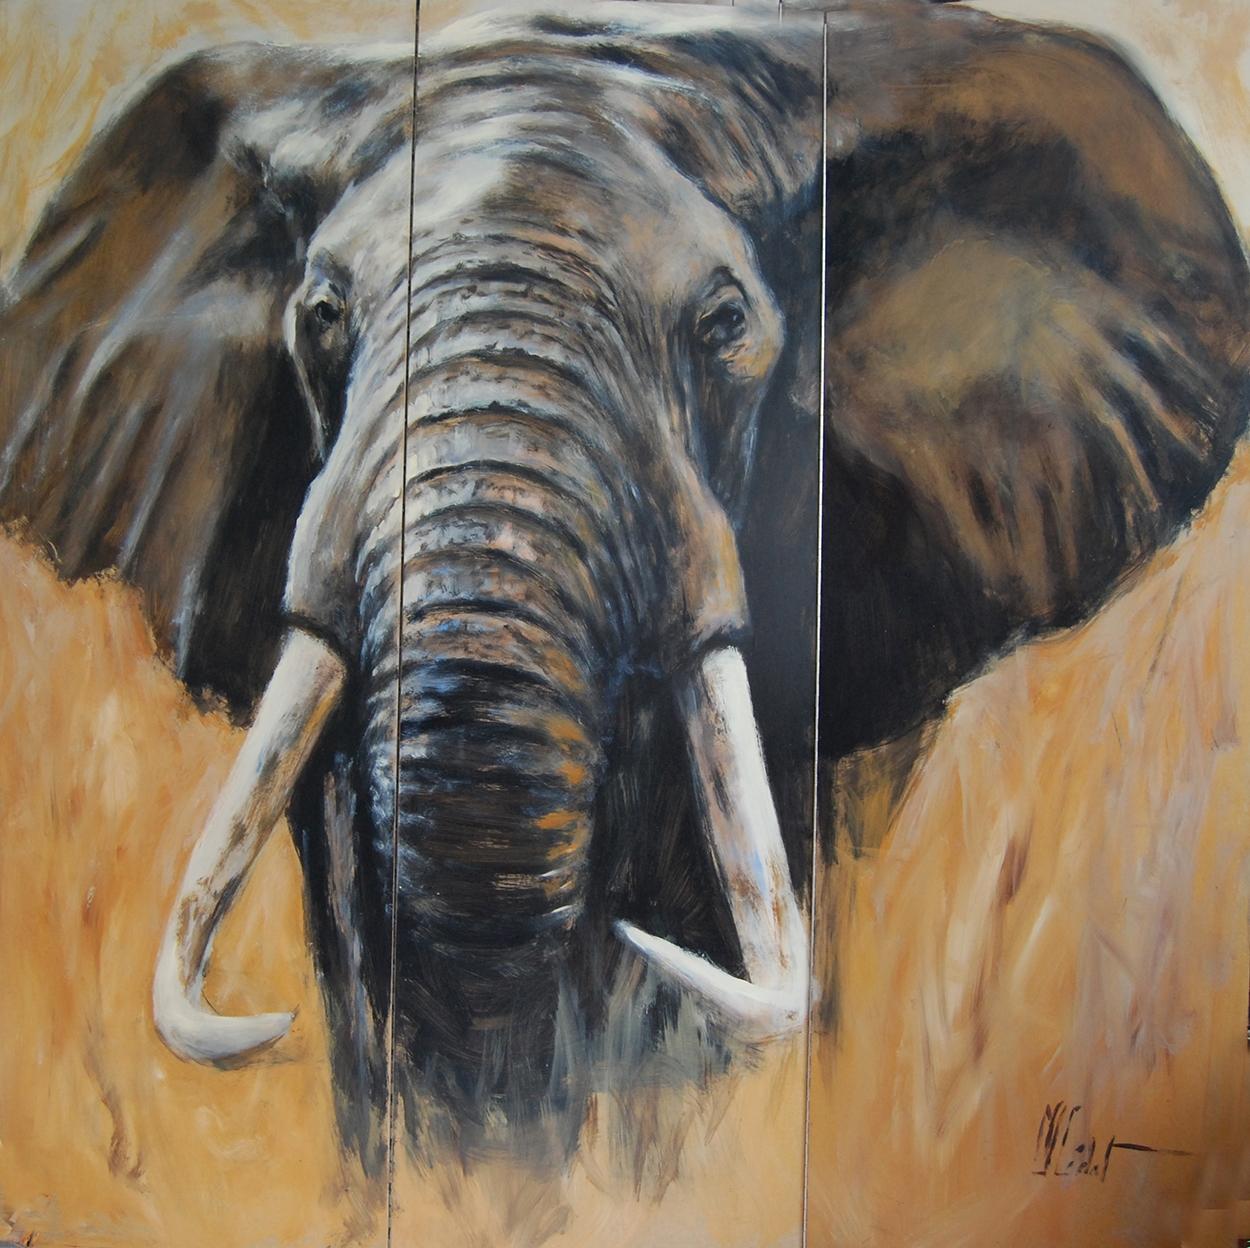 paravent 4 recto éléphant-Marie-Joëlle Cédat-artiste animalier peinture animaliere-art-animalier- peintre-animalier